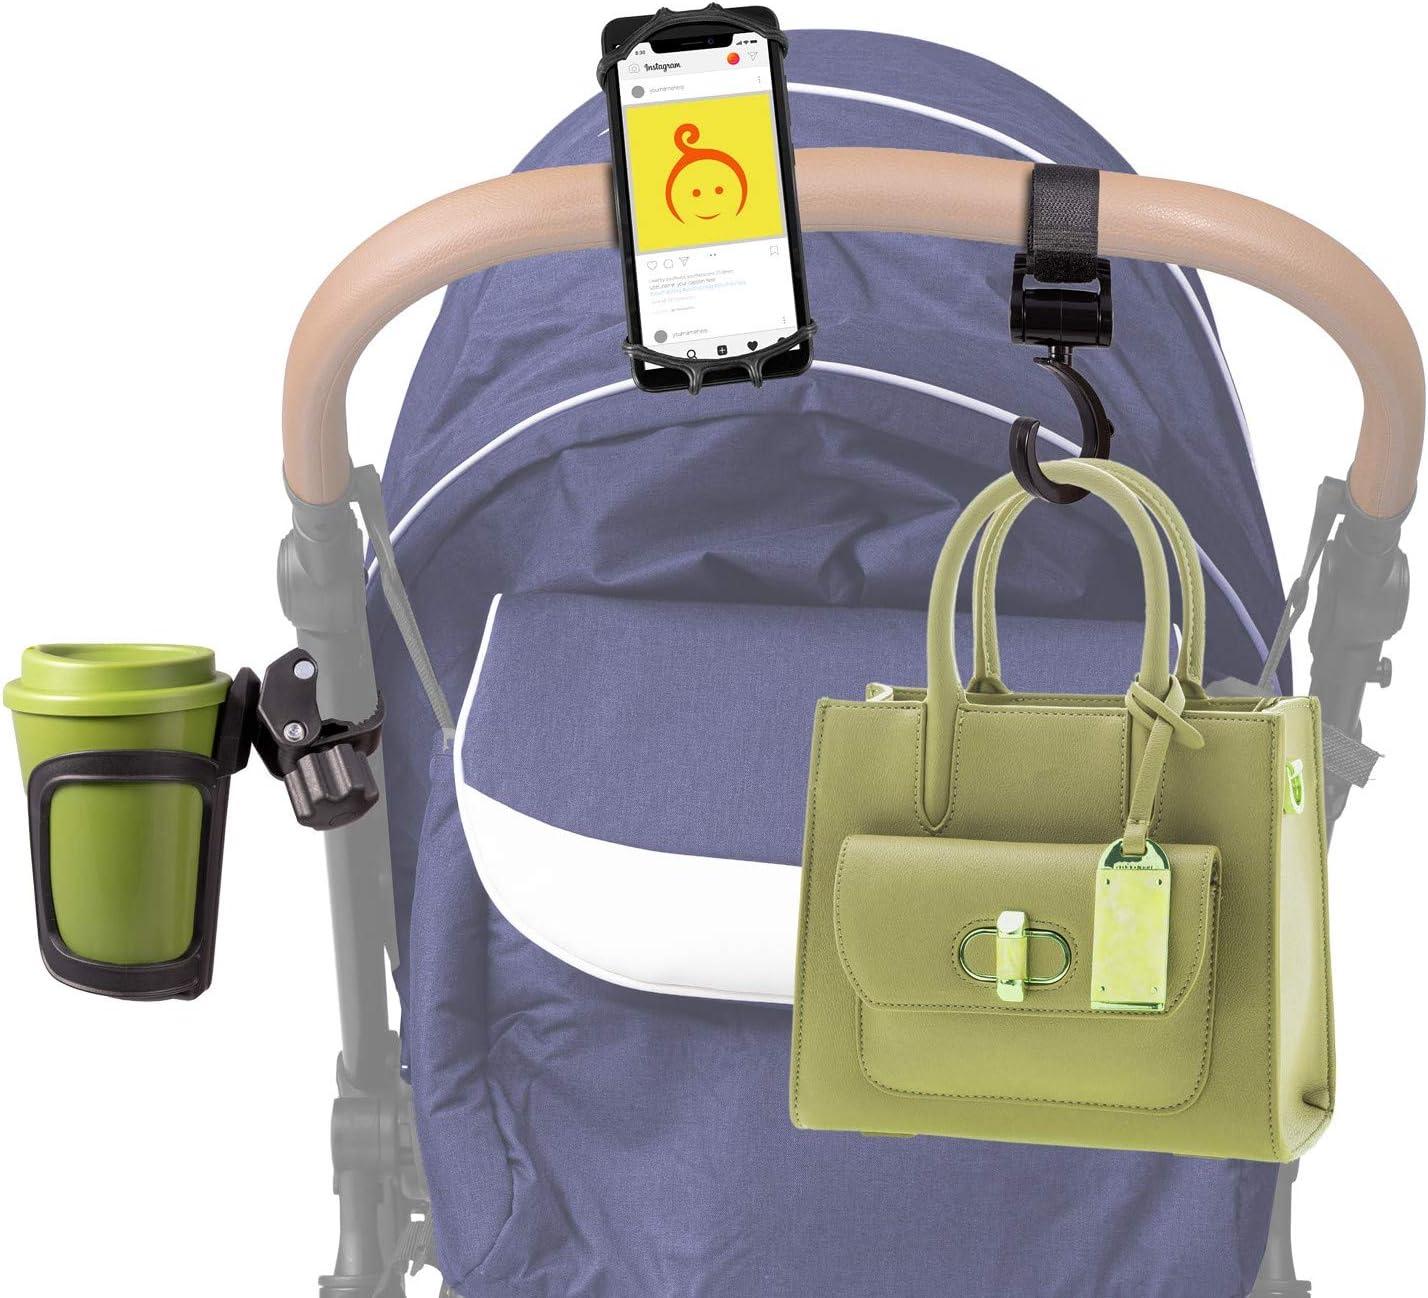 Bottle//Cup Holder Stroller Hooks Box Mobile Holder Buggy Bag Hooks Kit-Cupholder Phone Holder Universal PRAM Accessories Pack for New Parents